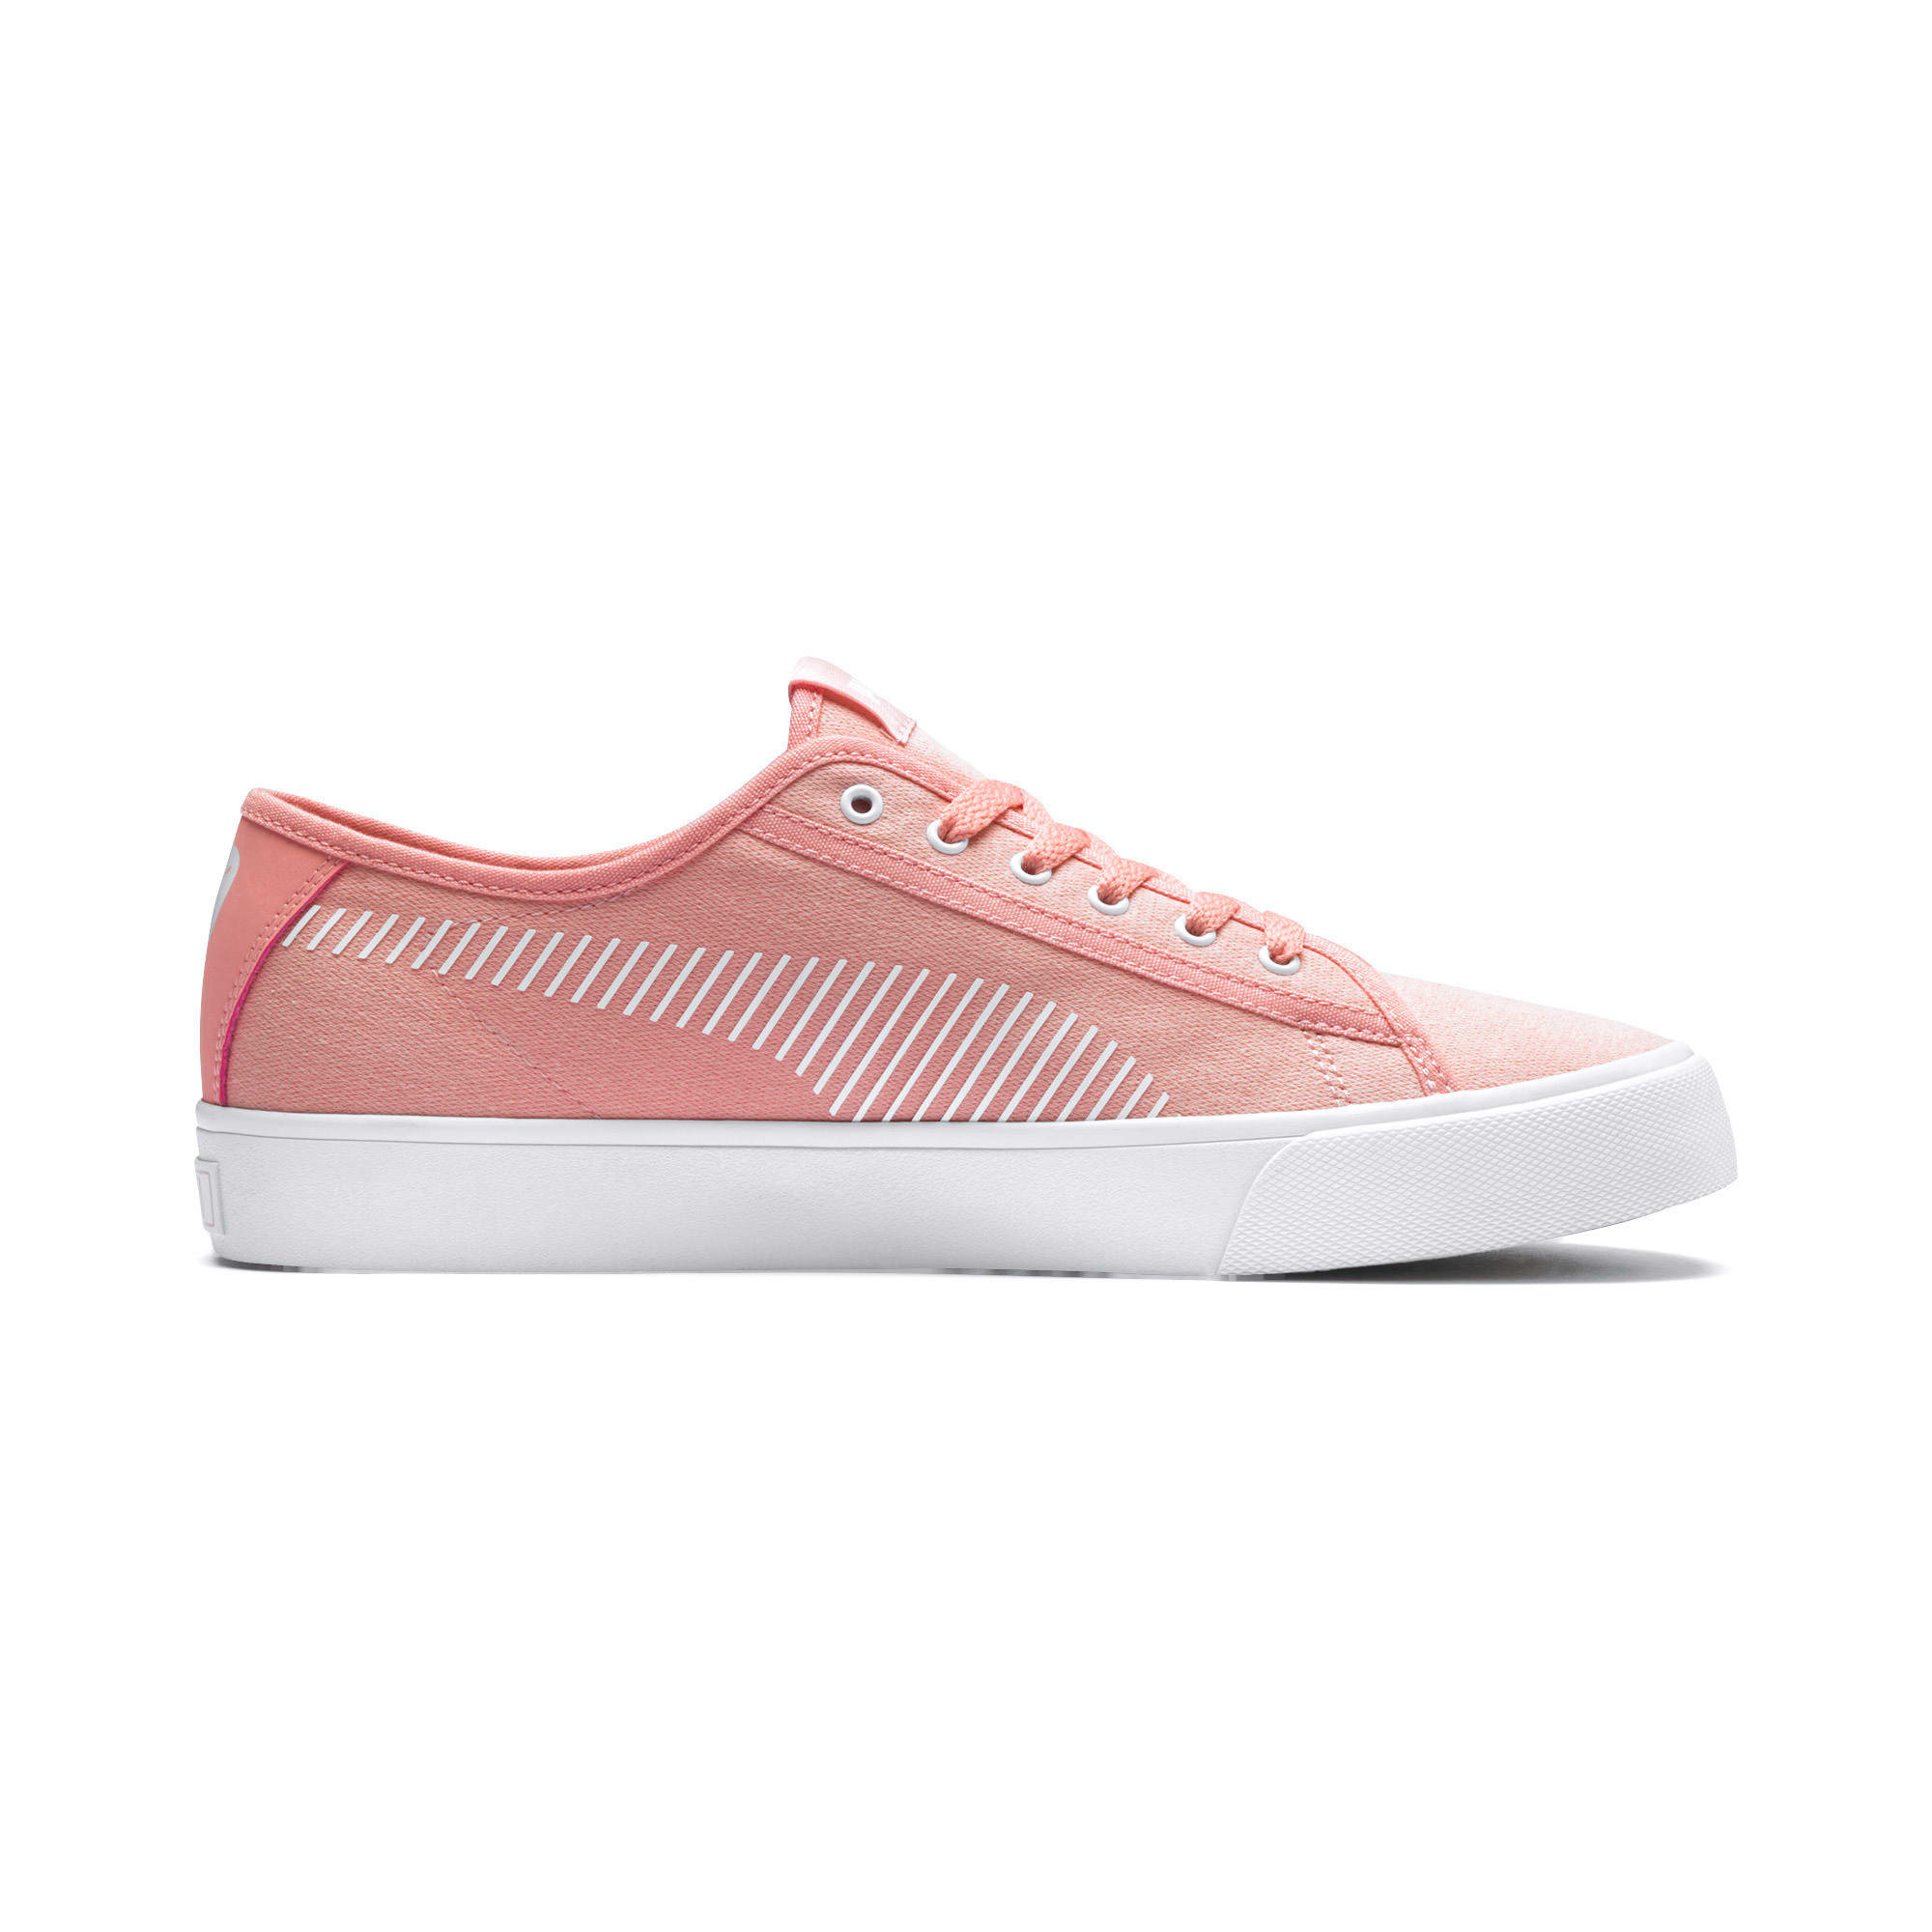 Thumbnail 5 of Bari Sneakers, Peach Bud-Puma White, medium